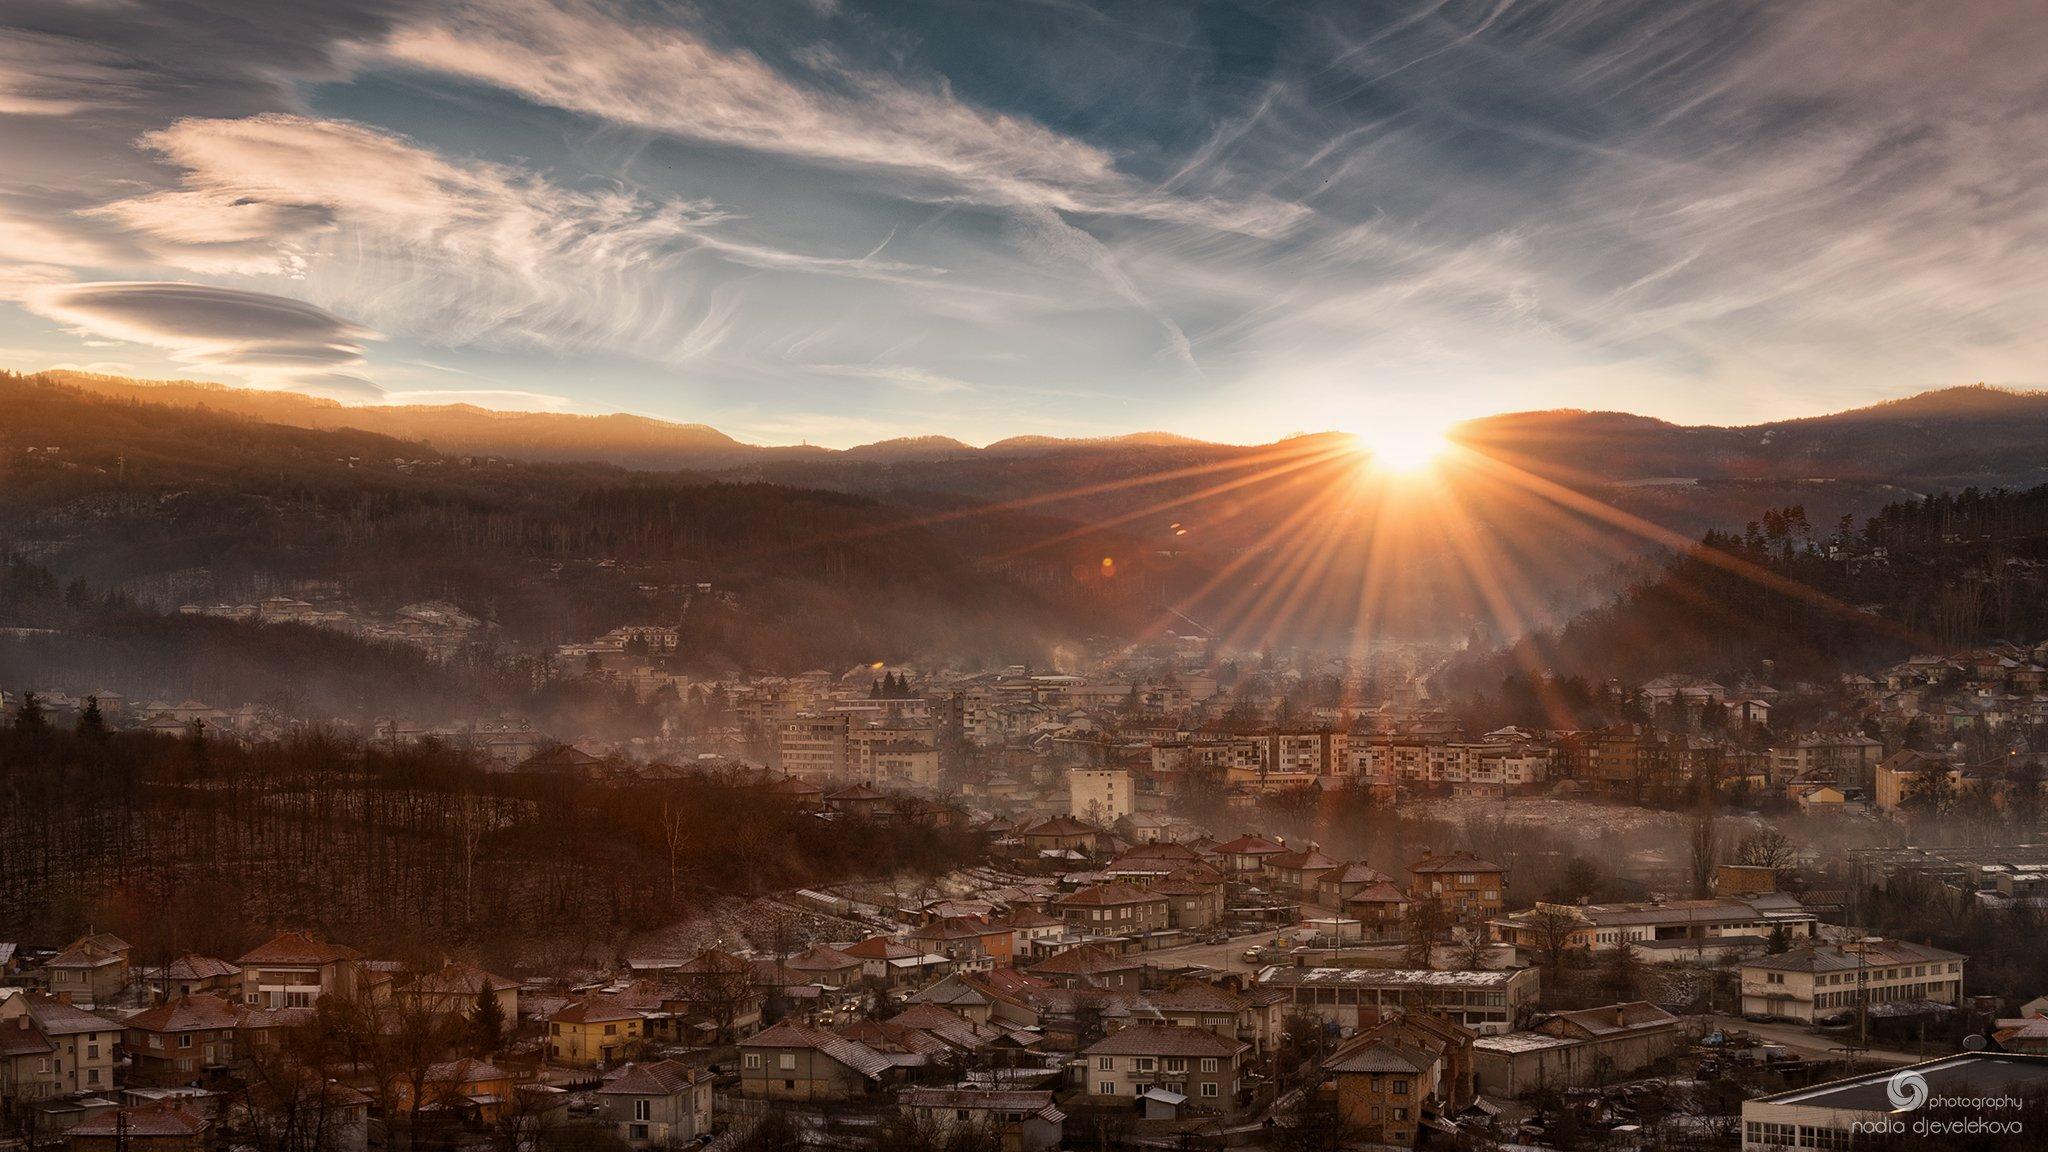 sunset, winter, sky, sun, clouds, cloudscape, tryavna, bulgaria, Надя Джевелекова